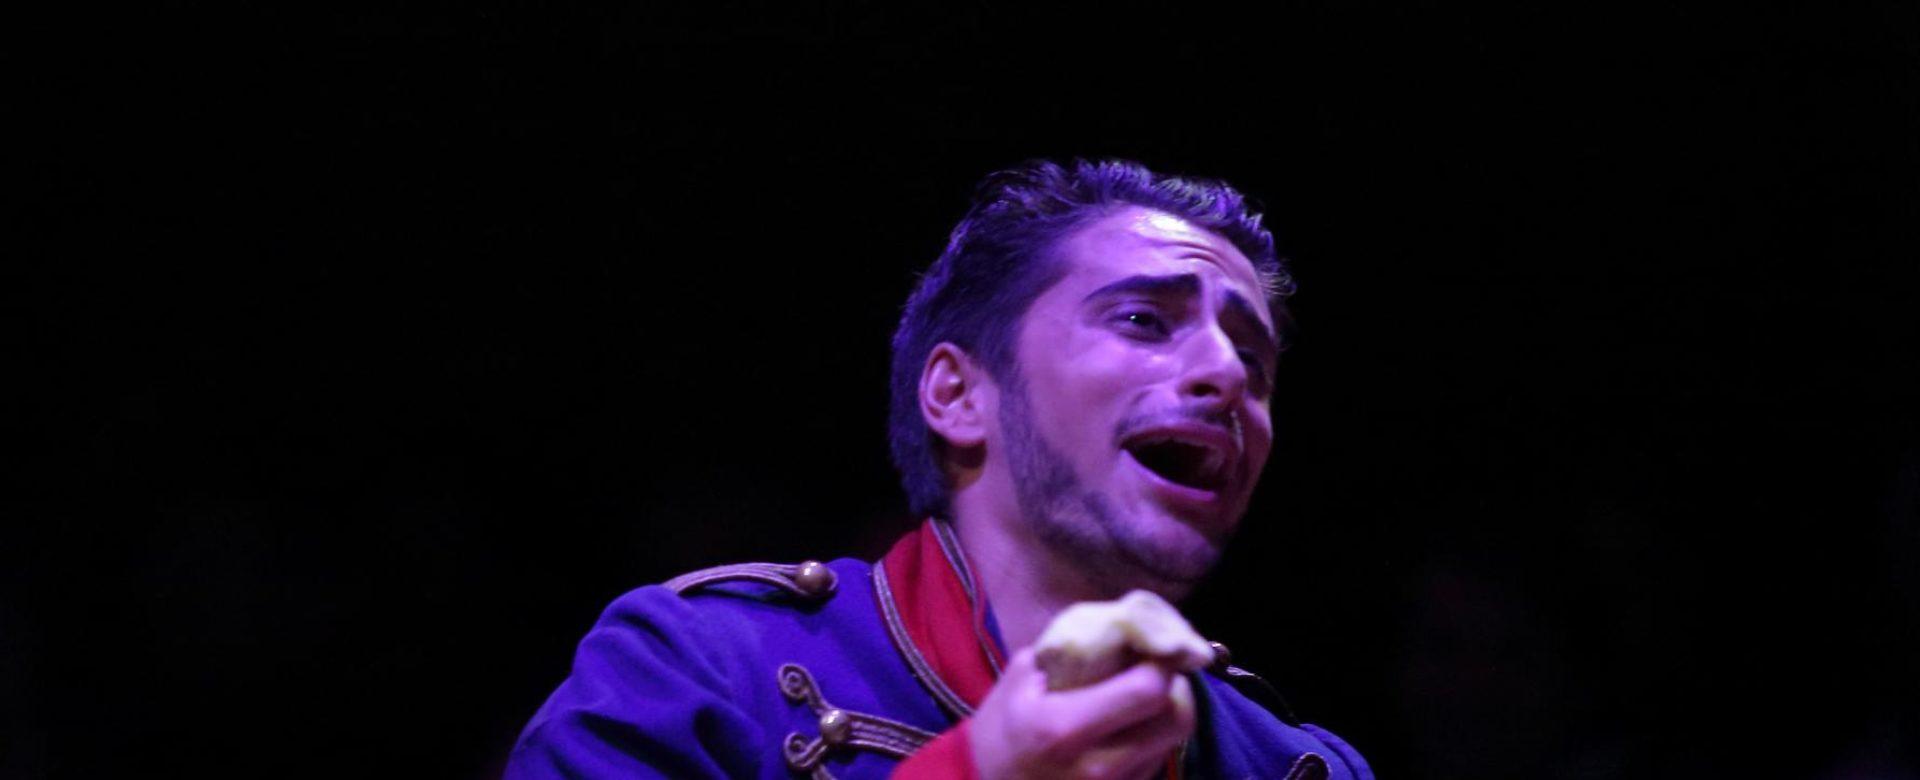 Riccardo Romeo